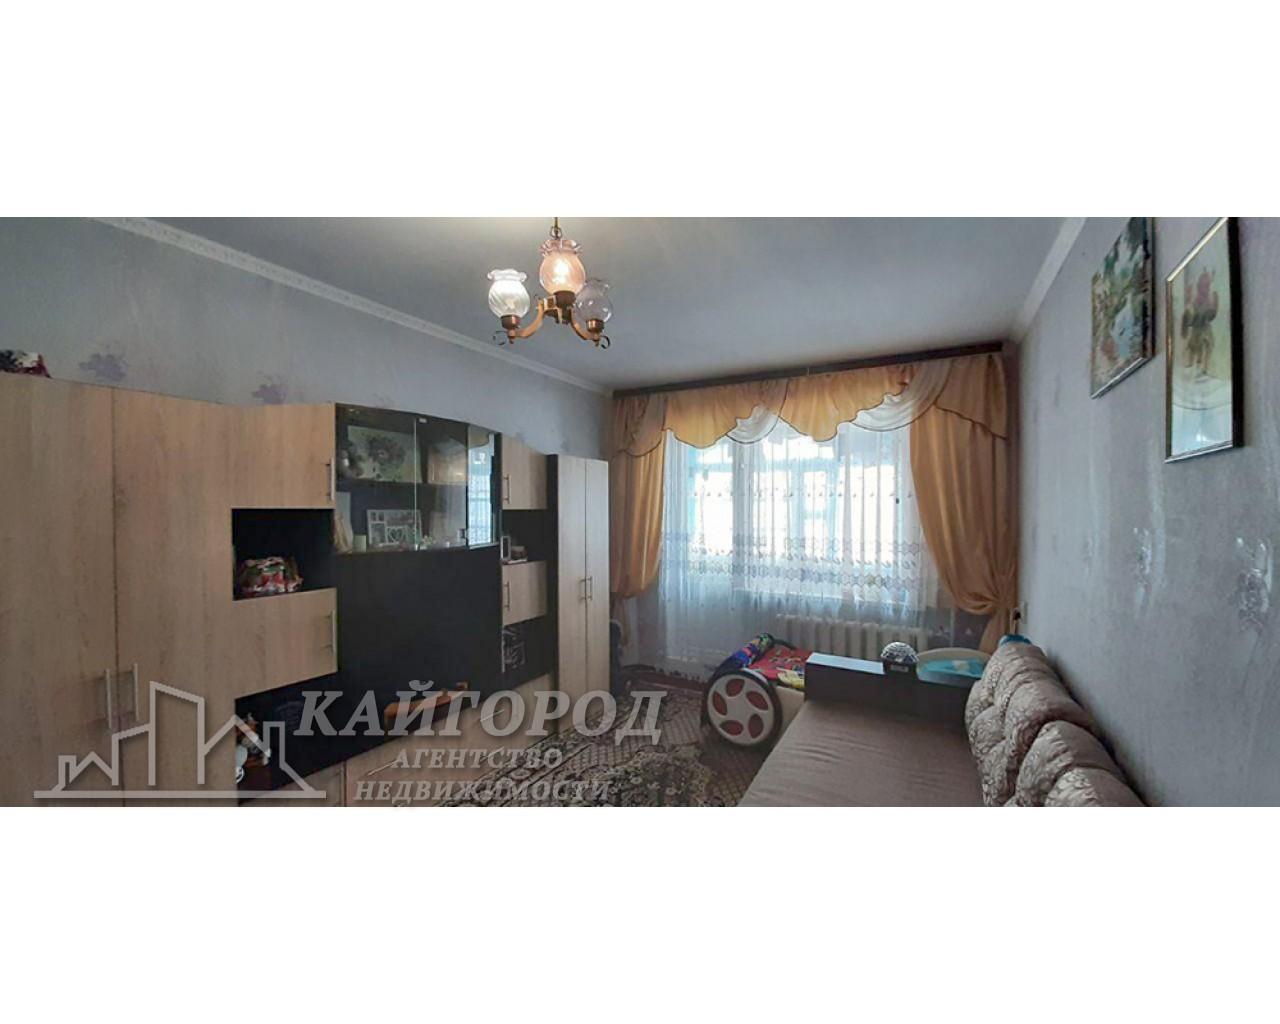 Продам 3-х комнатную квартиру на массиве Леваневский, район АТБ